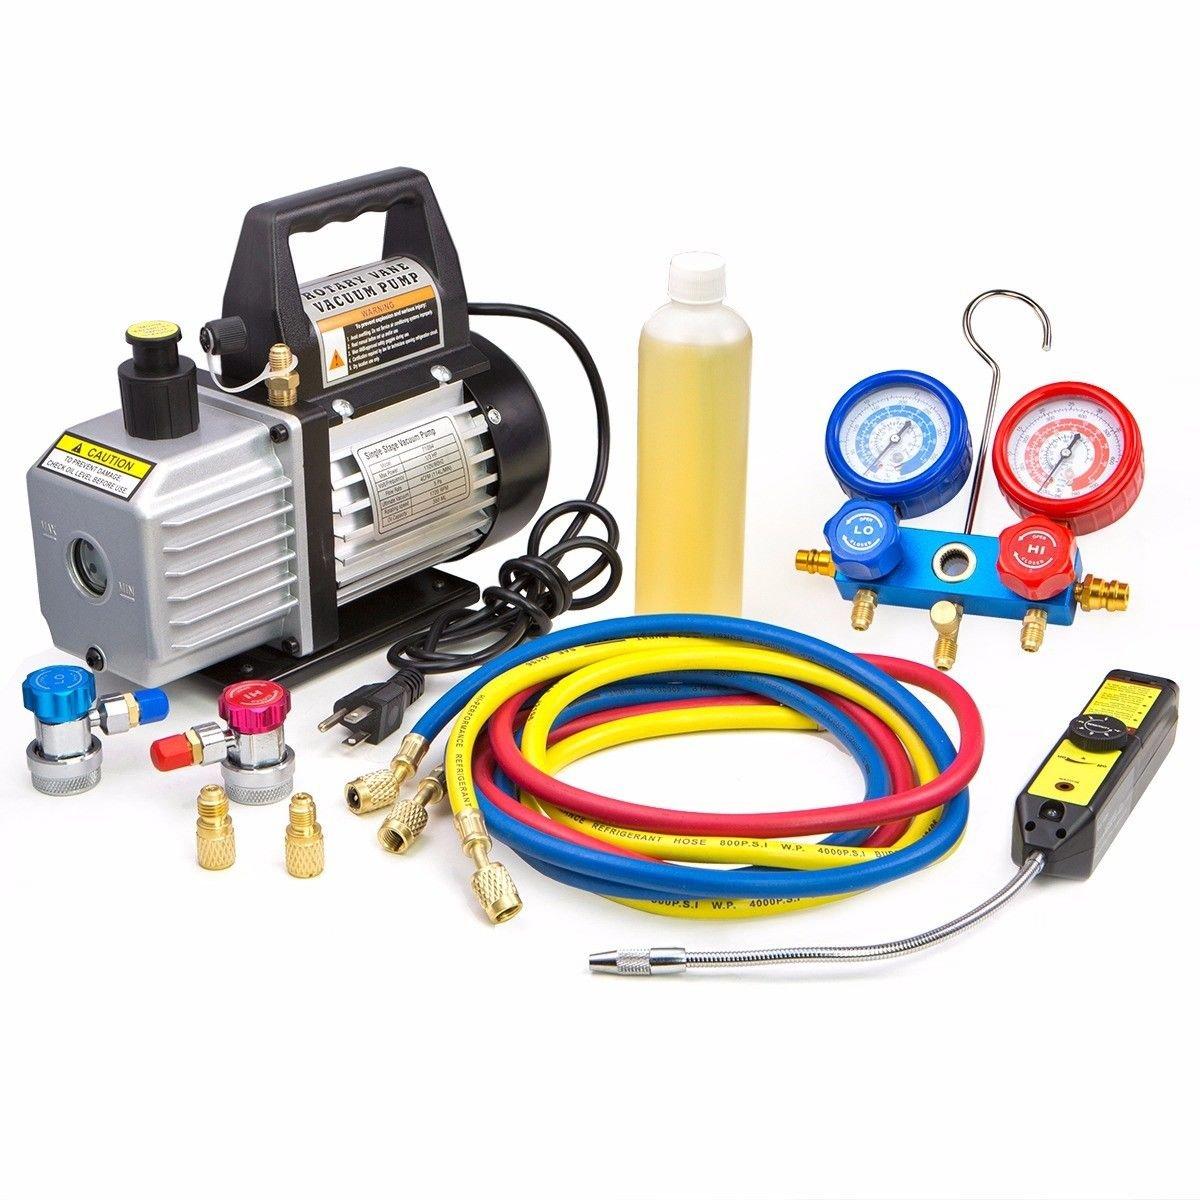 Lotus Analin 4CFM Vacuum Pump Manifold AC Sale Special Price HVAC Our shop OFFers the best service Gau Refrigeration